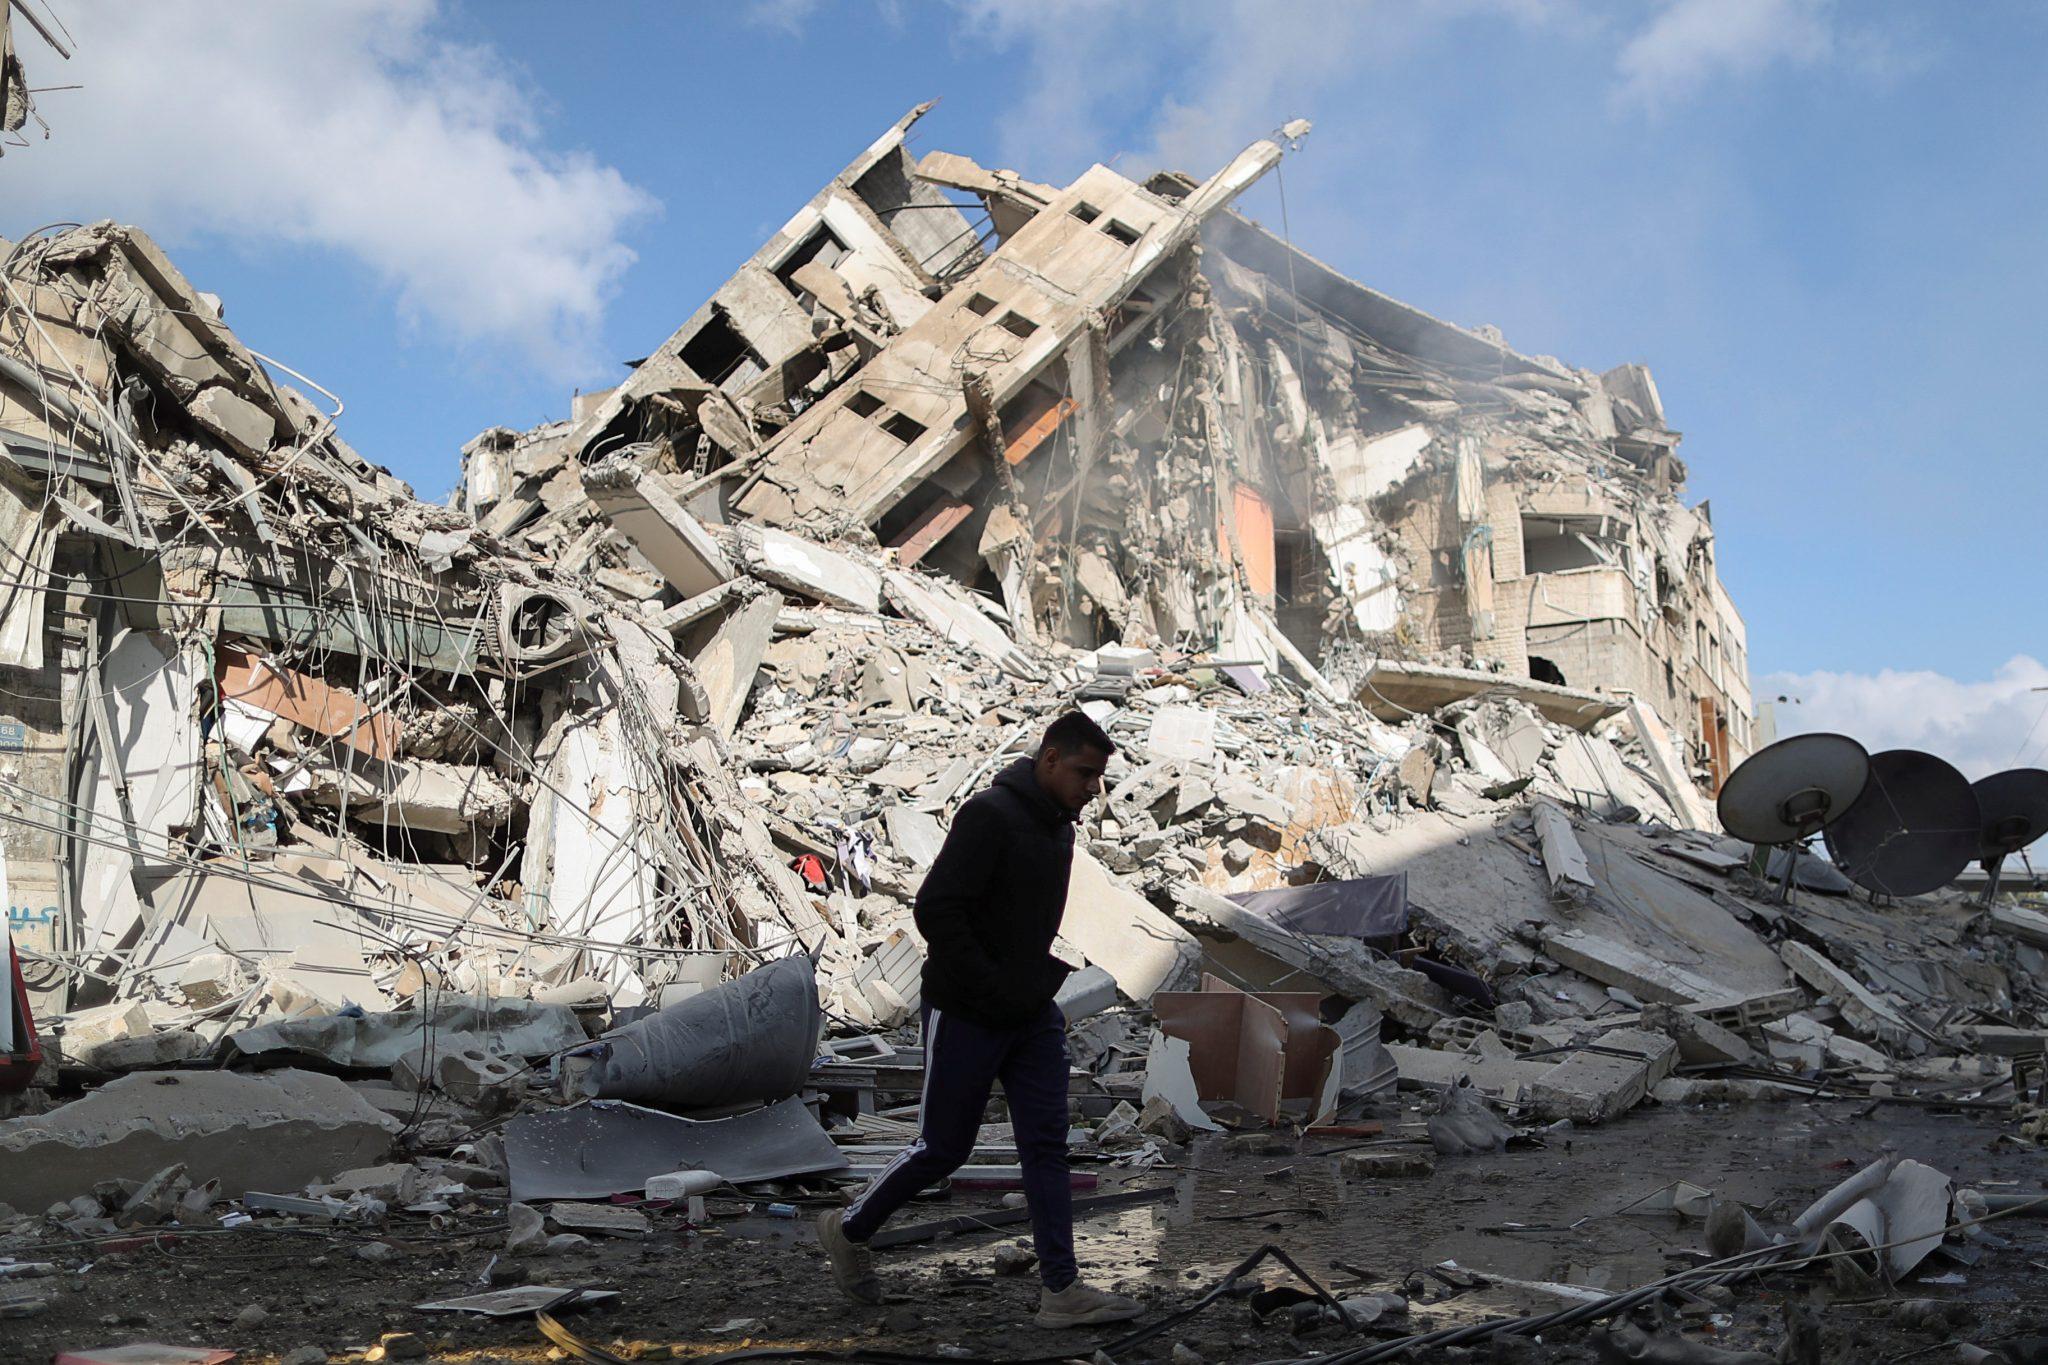 Australian politicians condemn Israeli aggression against Palestinians